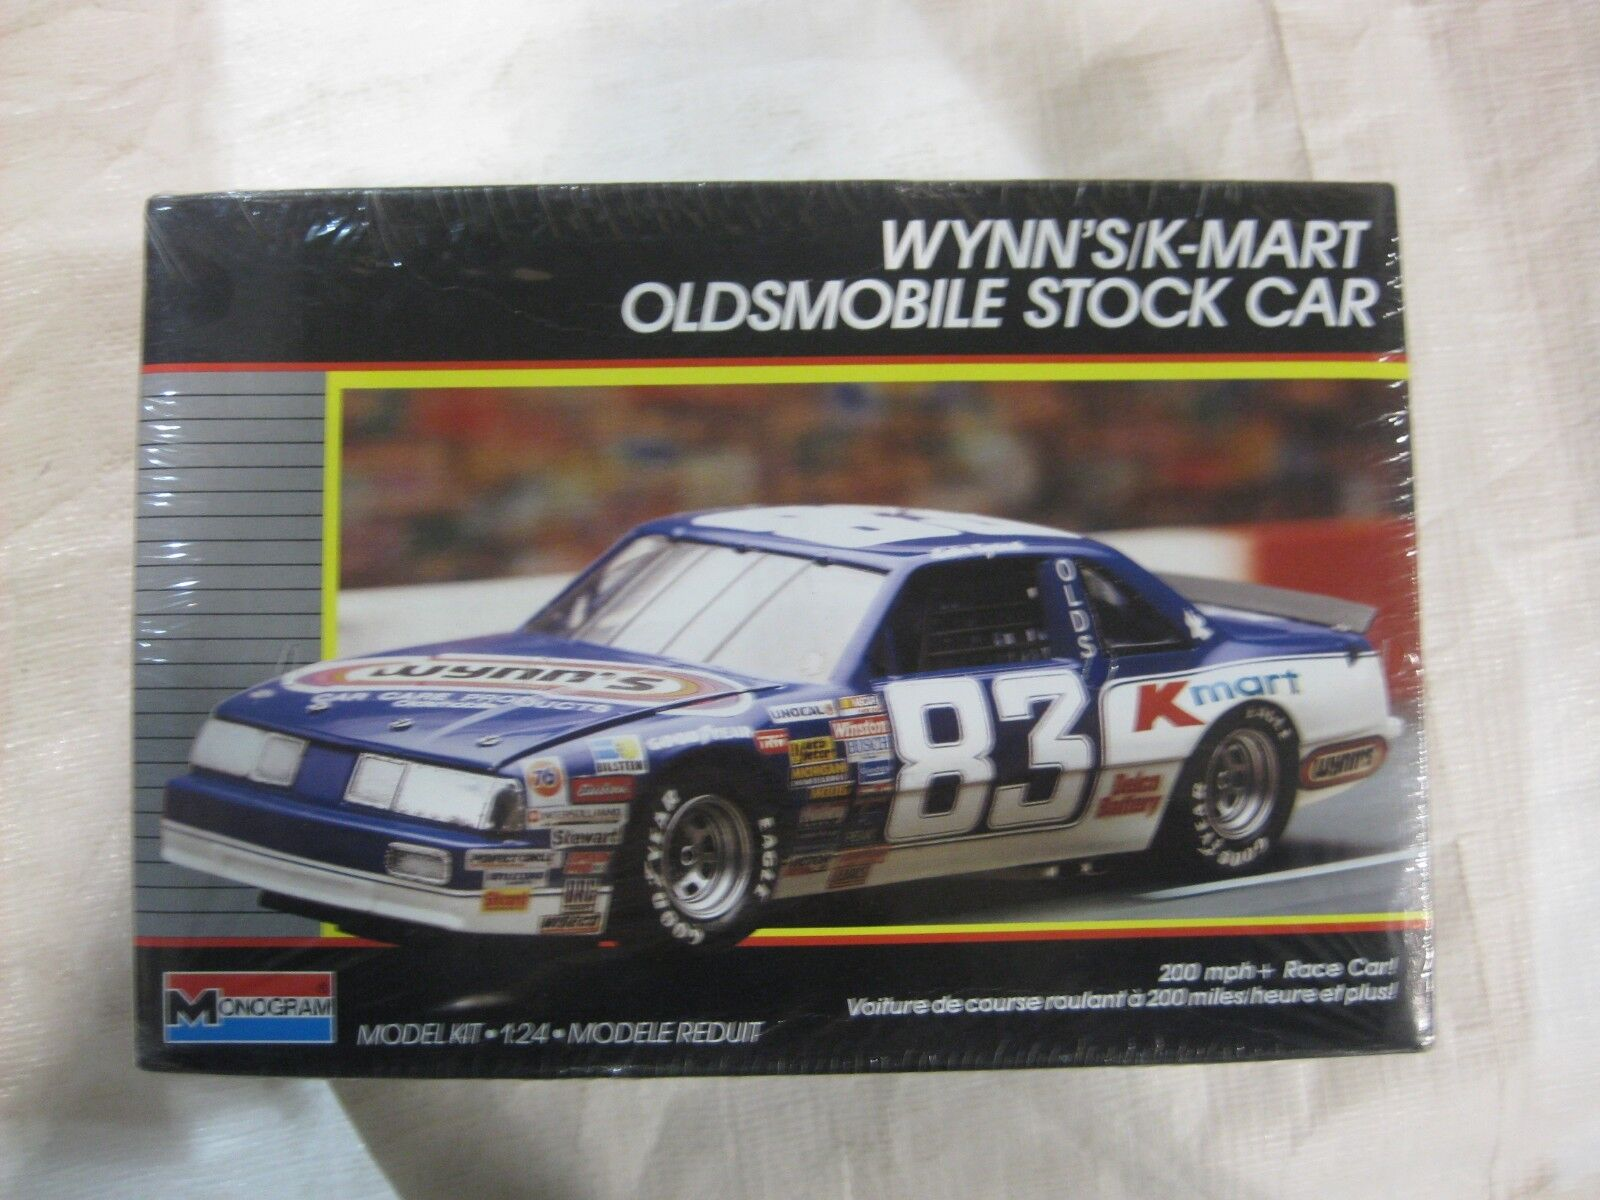 Raro Wynn's K-Mart Odlsmobile Nascar Kit de Modelismo Monogram 1988